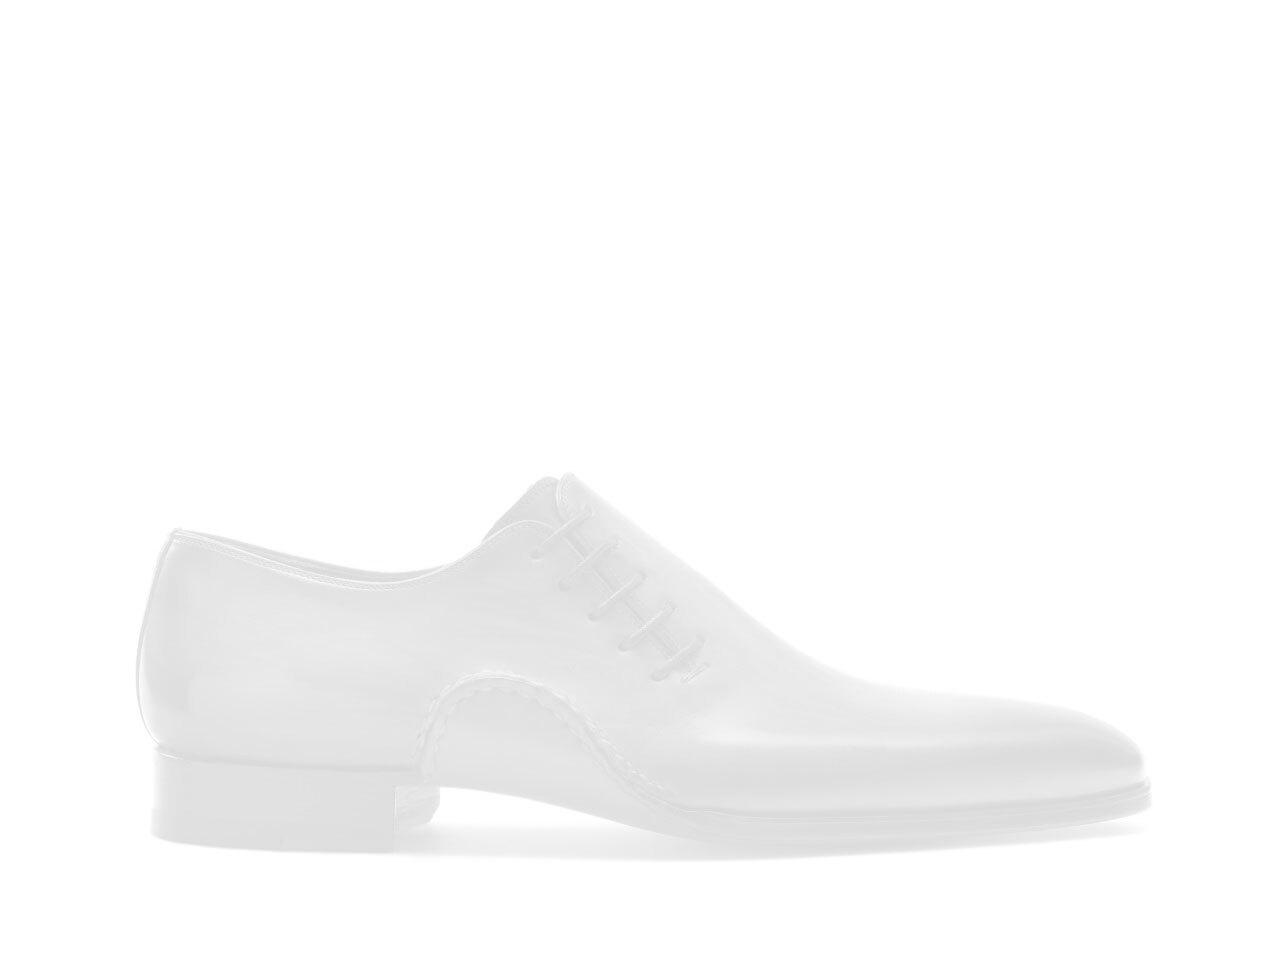 Designer shoes by Magnanni